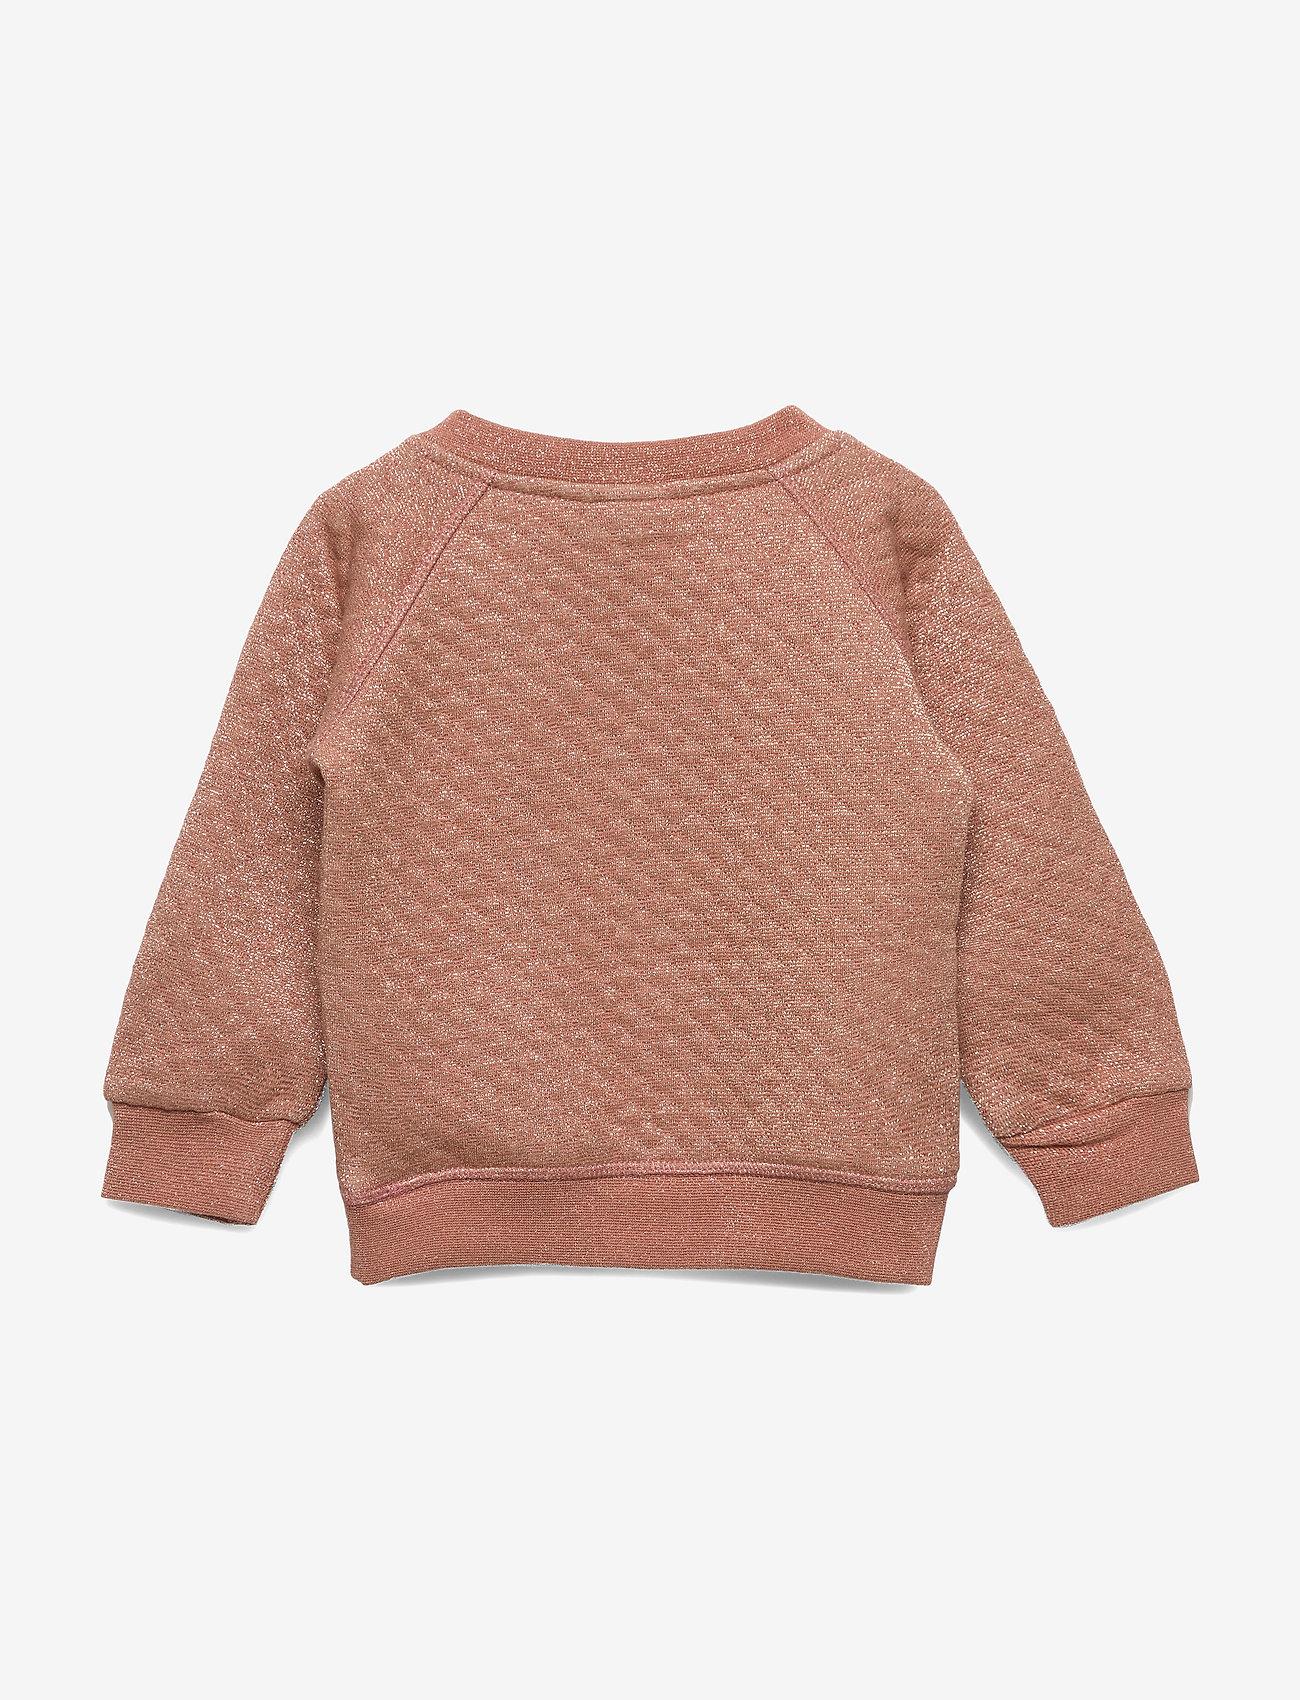 Petit by Sofie Schnoor - Sweat - sweatshirts - dusty rose - 1